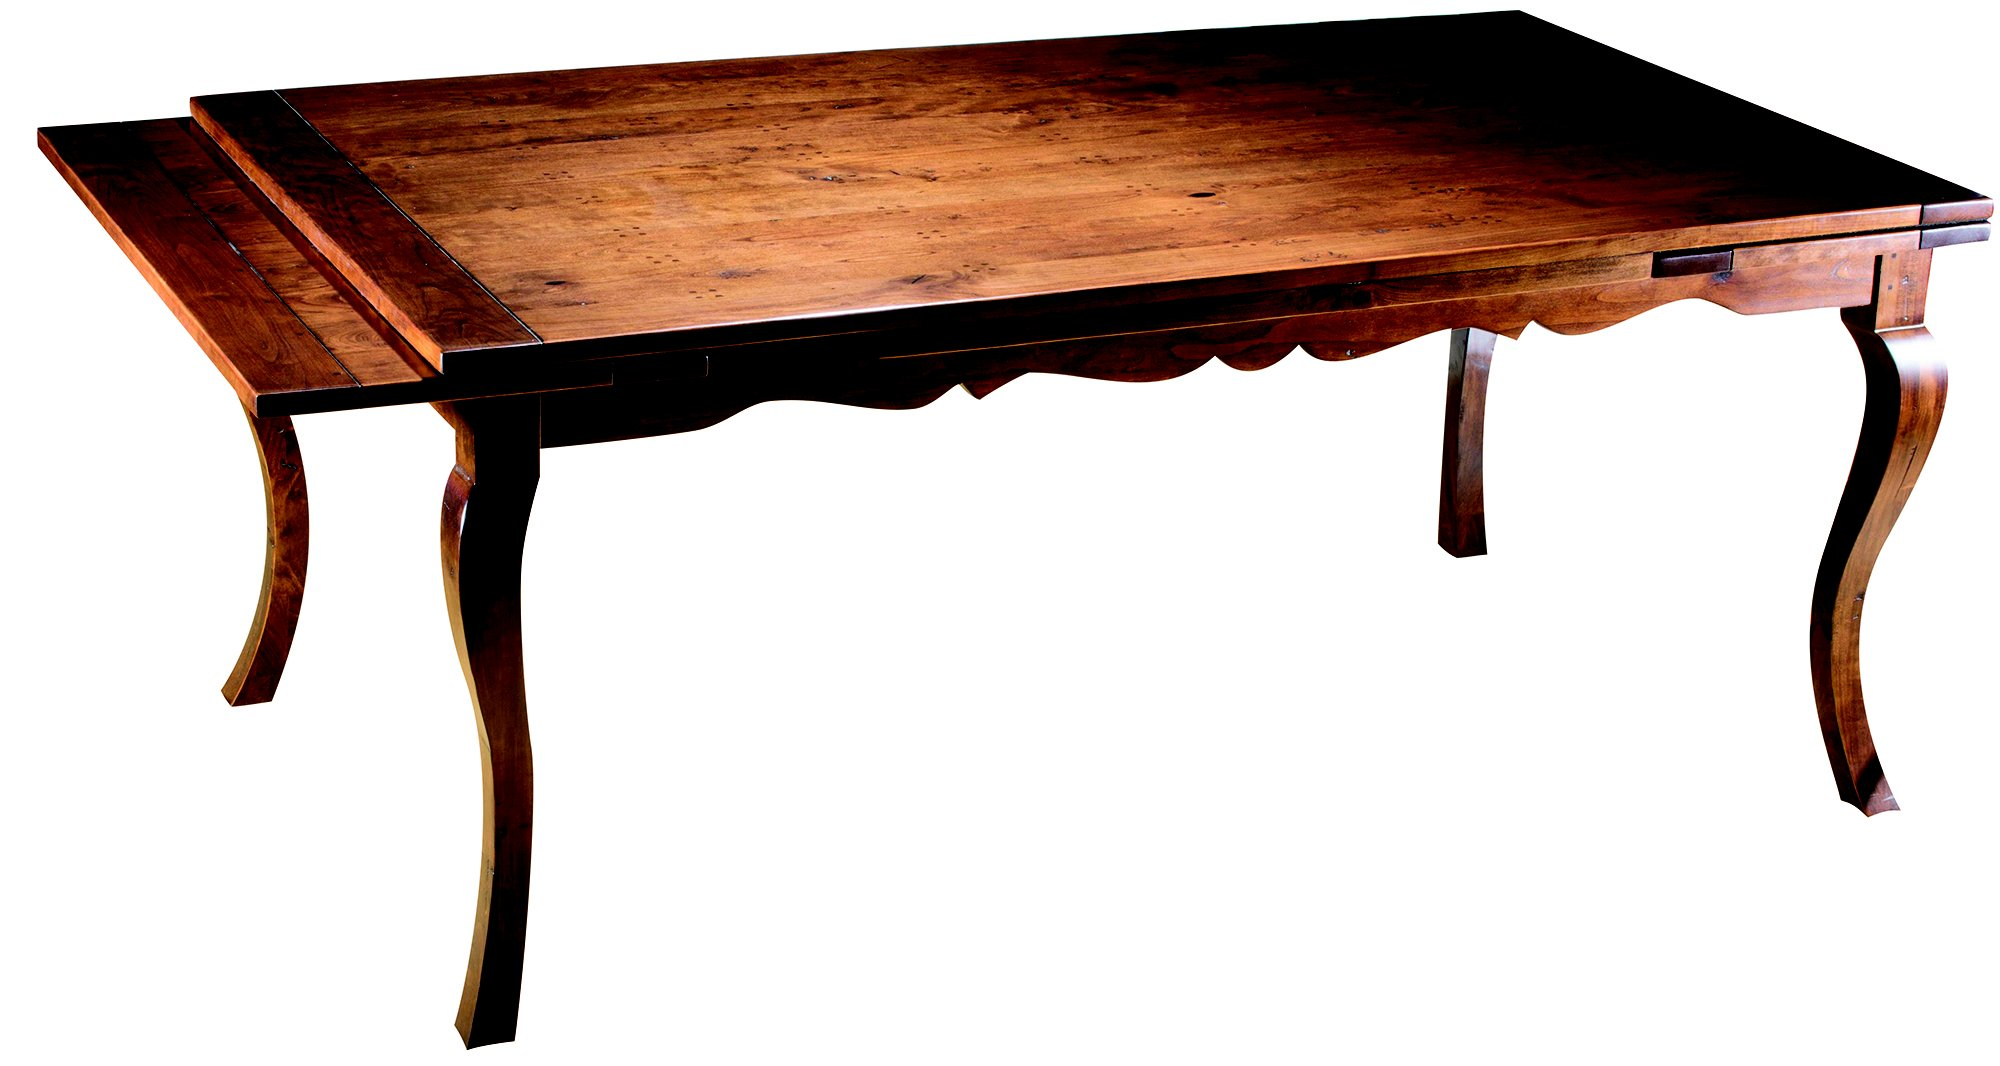 Office furniture design services trend home design and decor